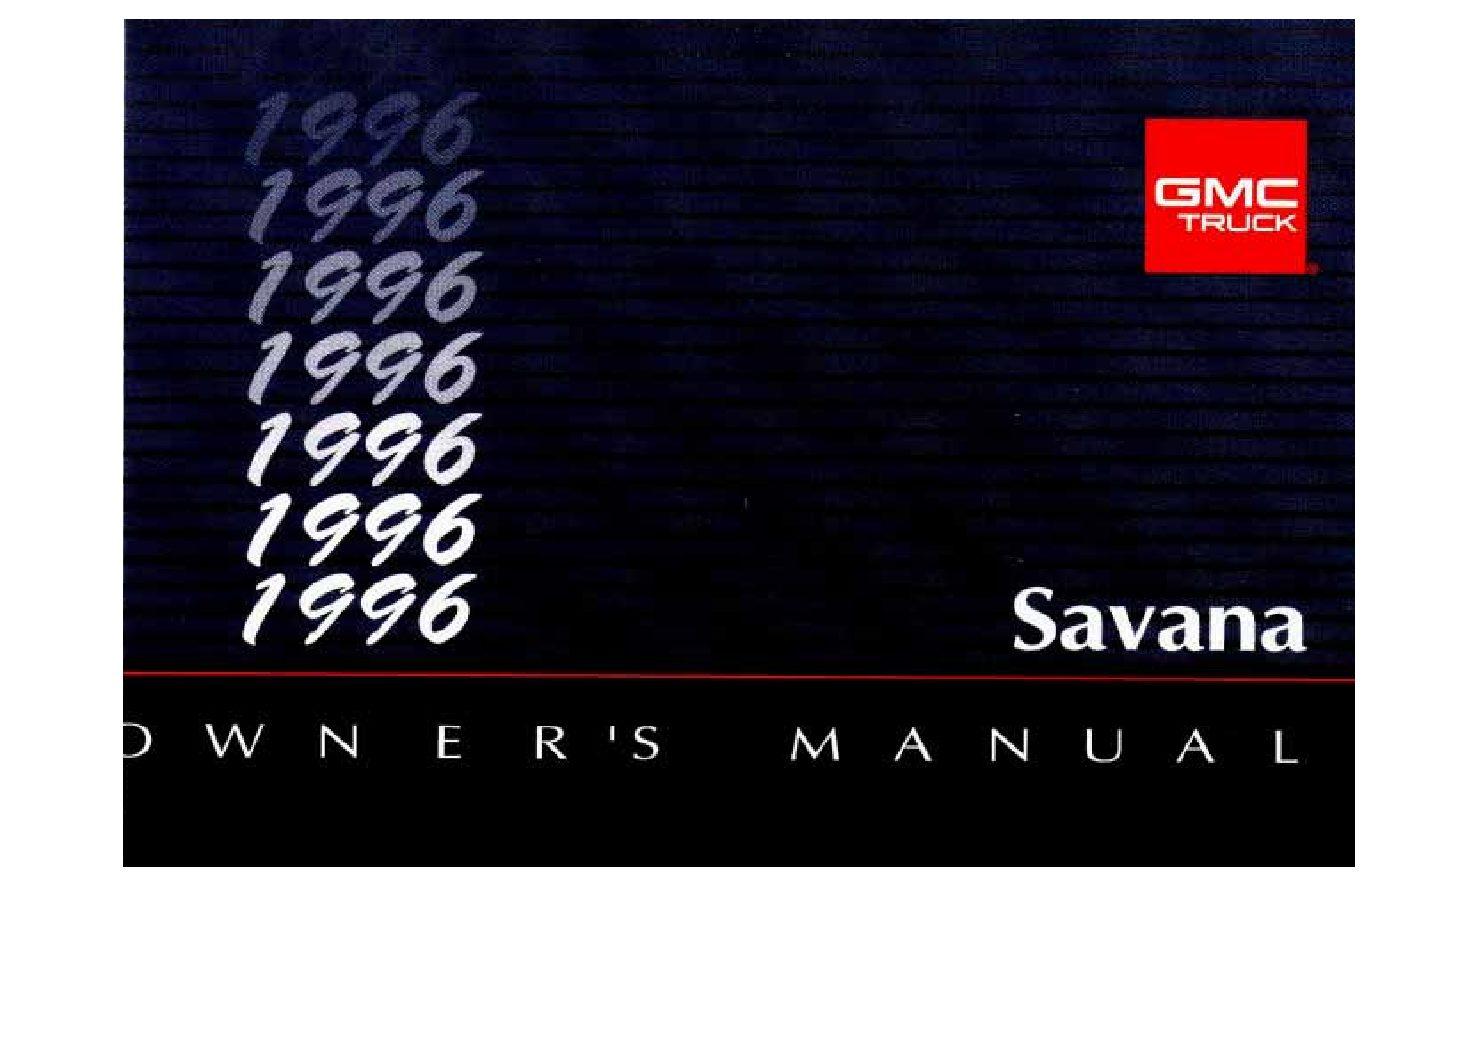 1996 gmc savana owners manual just give me the damn manual rh justgivemethedamnmanual com 2017 gmc savana owners manual 2010 gmc savana owners manual